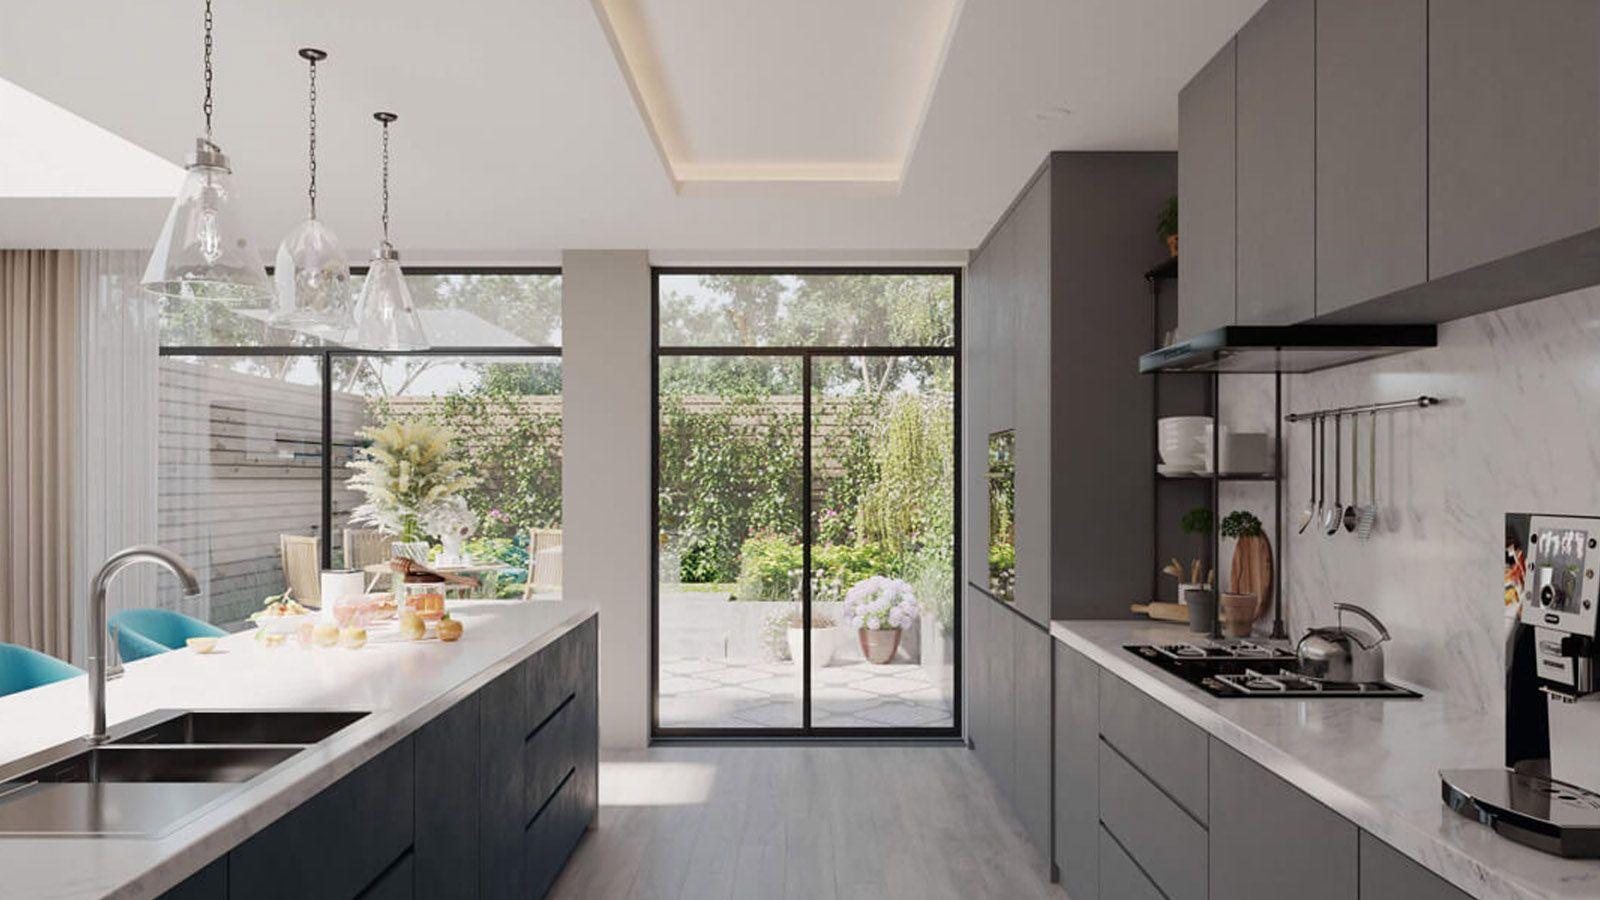 Large House Extension Designed under Larger Home Extension Scheme